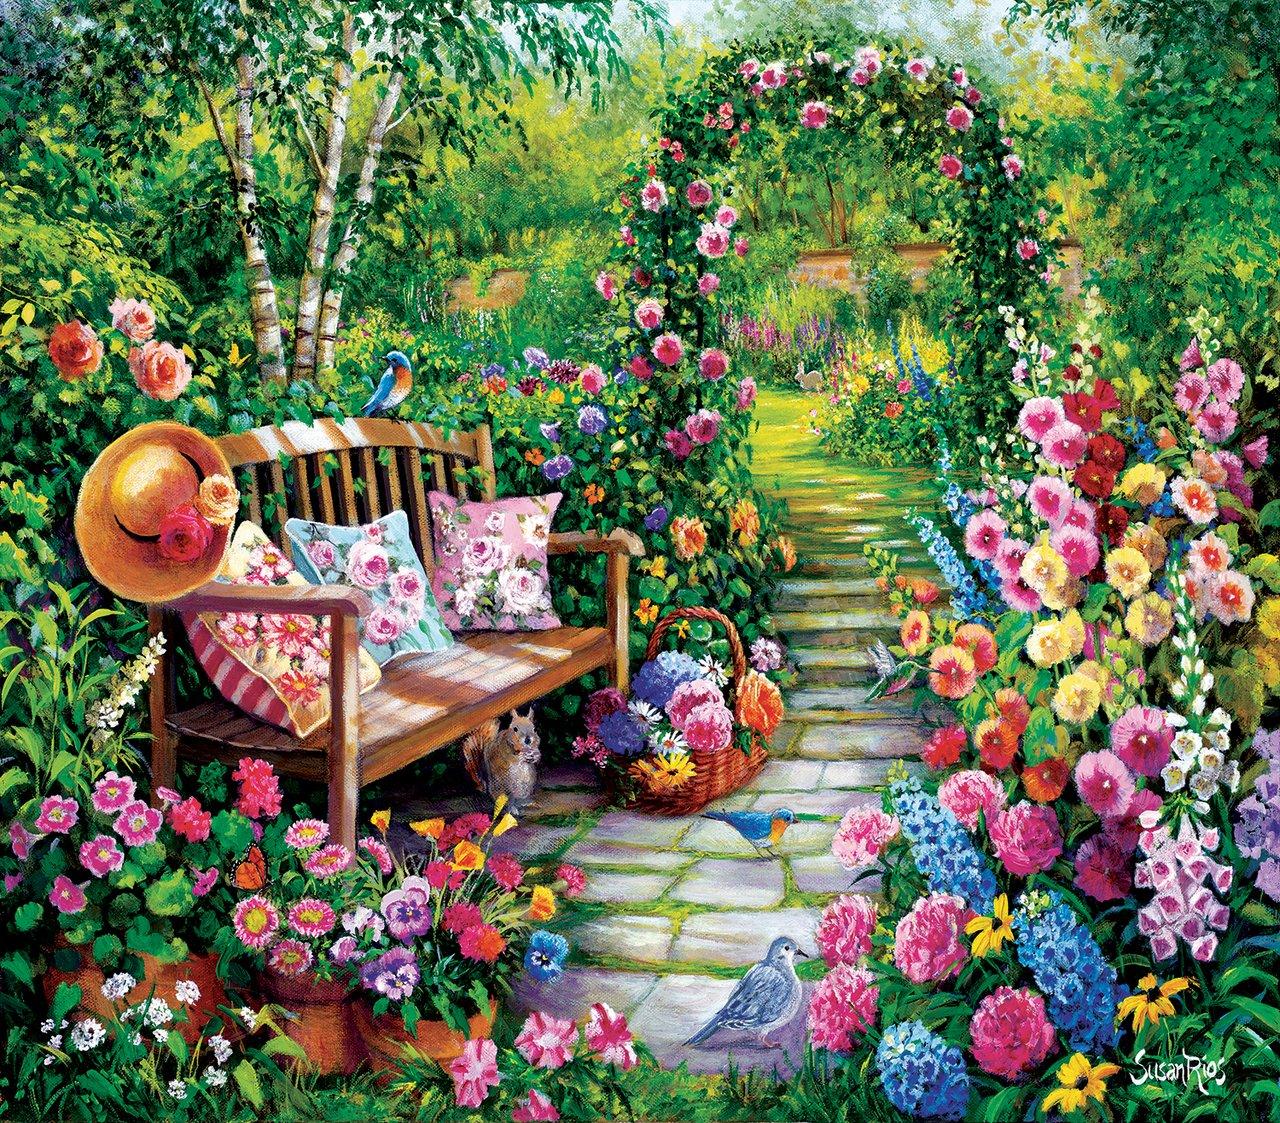 Kim's Garden - 1,000 Piece Puzzle